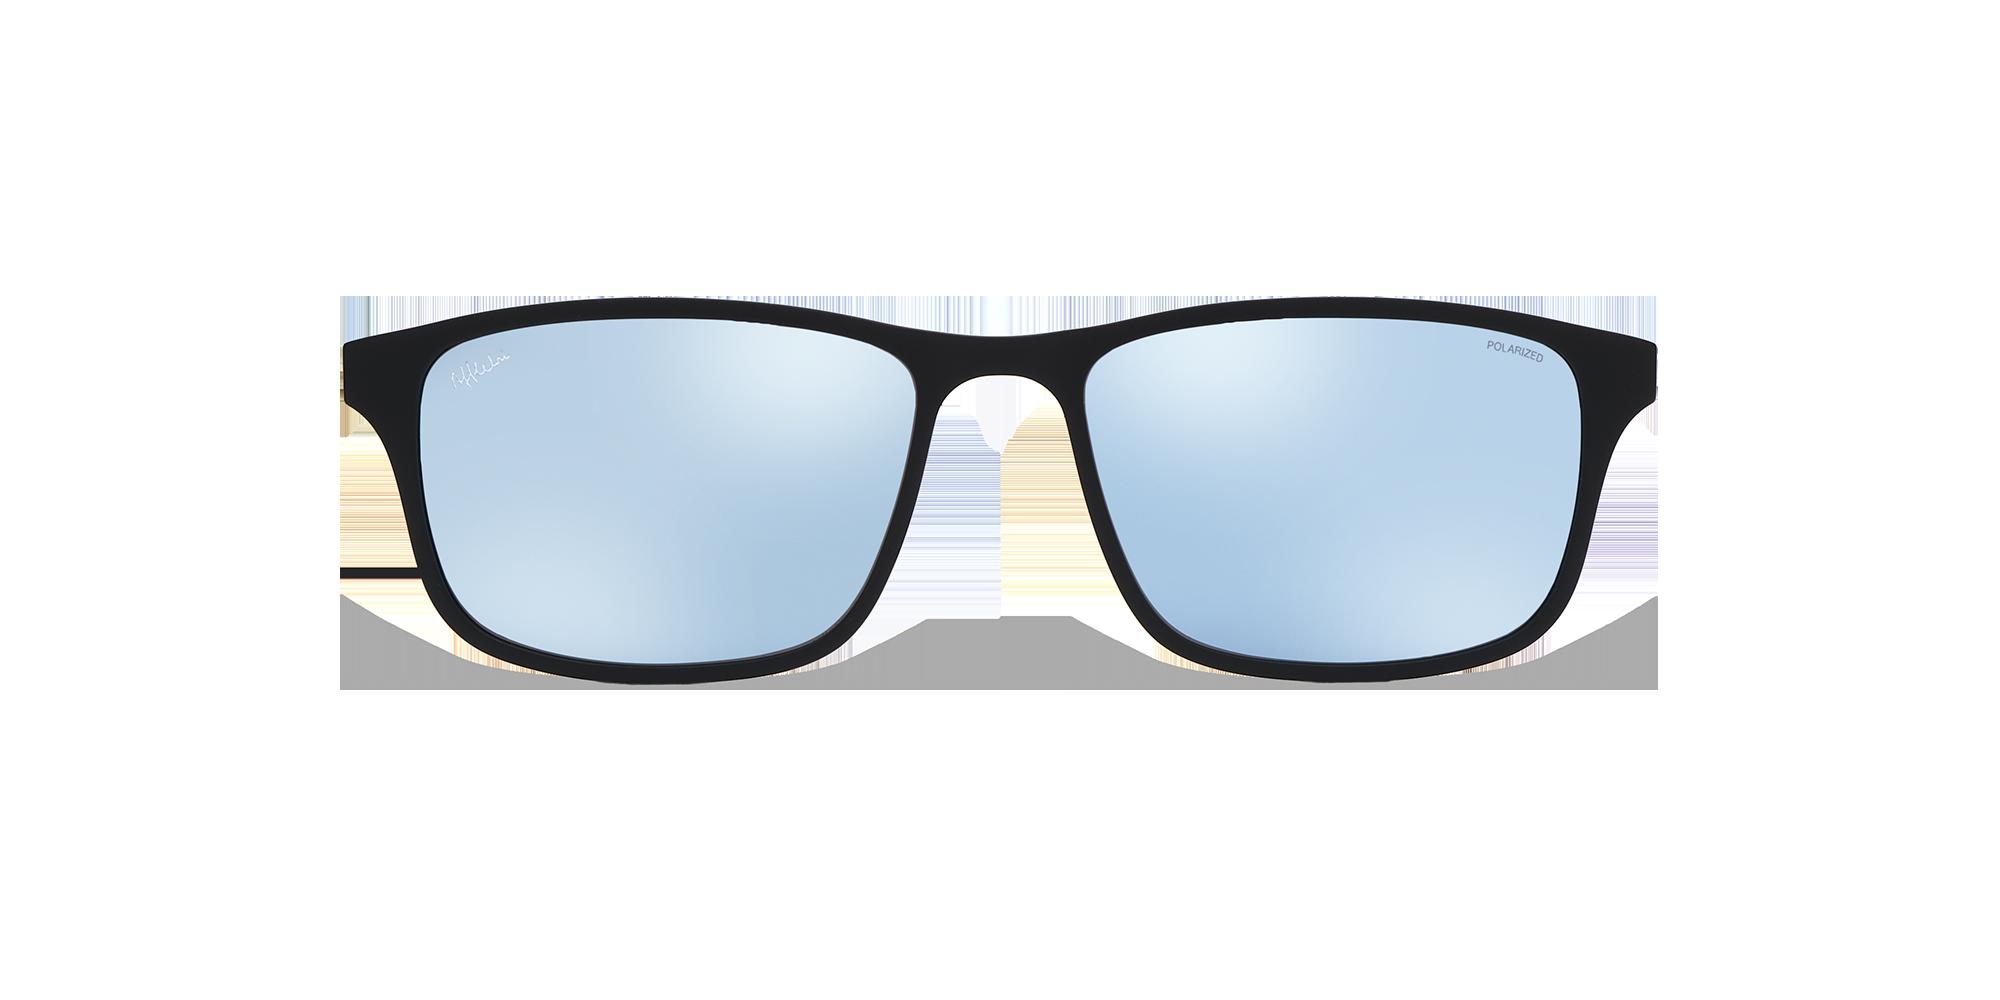 afflelou/france/products/smart_clip/clips_glasses/TMK41PRBK015416.png